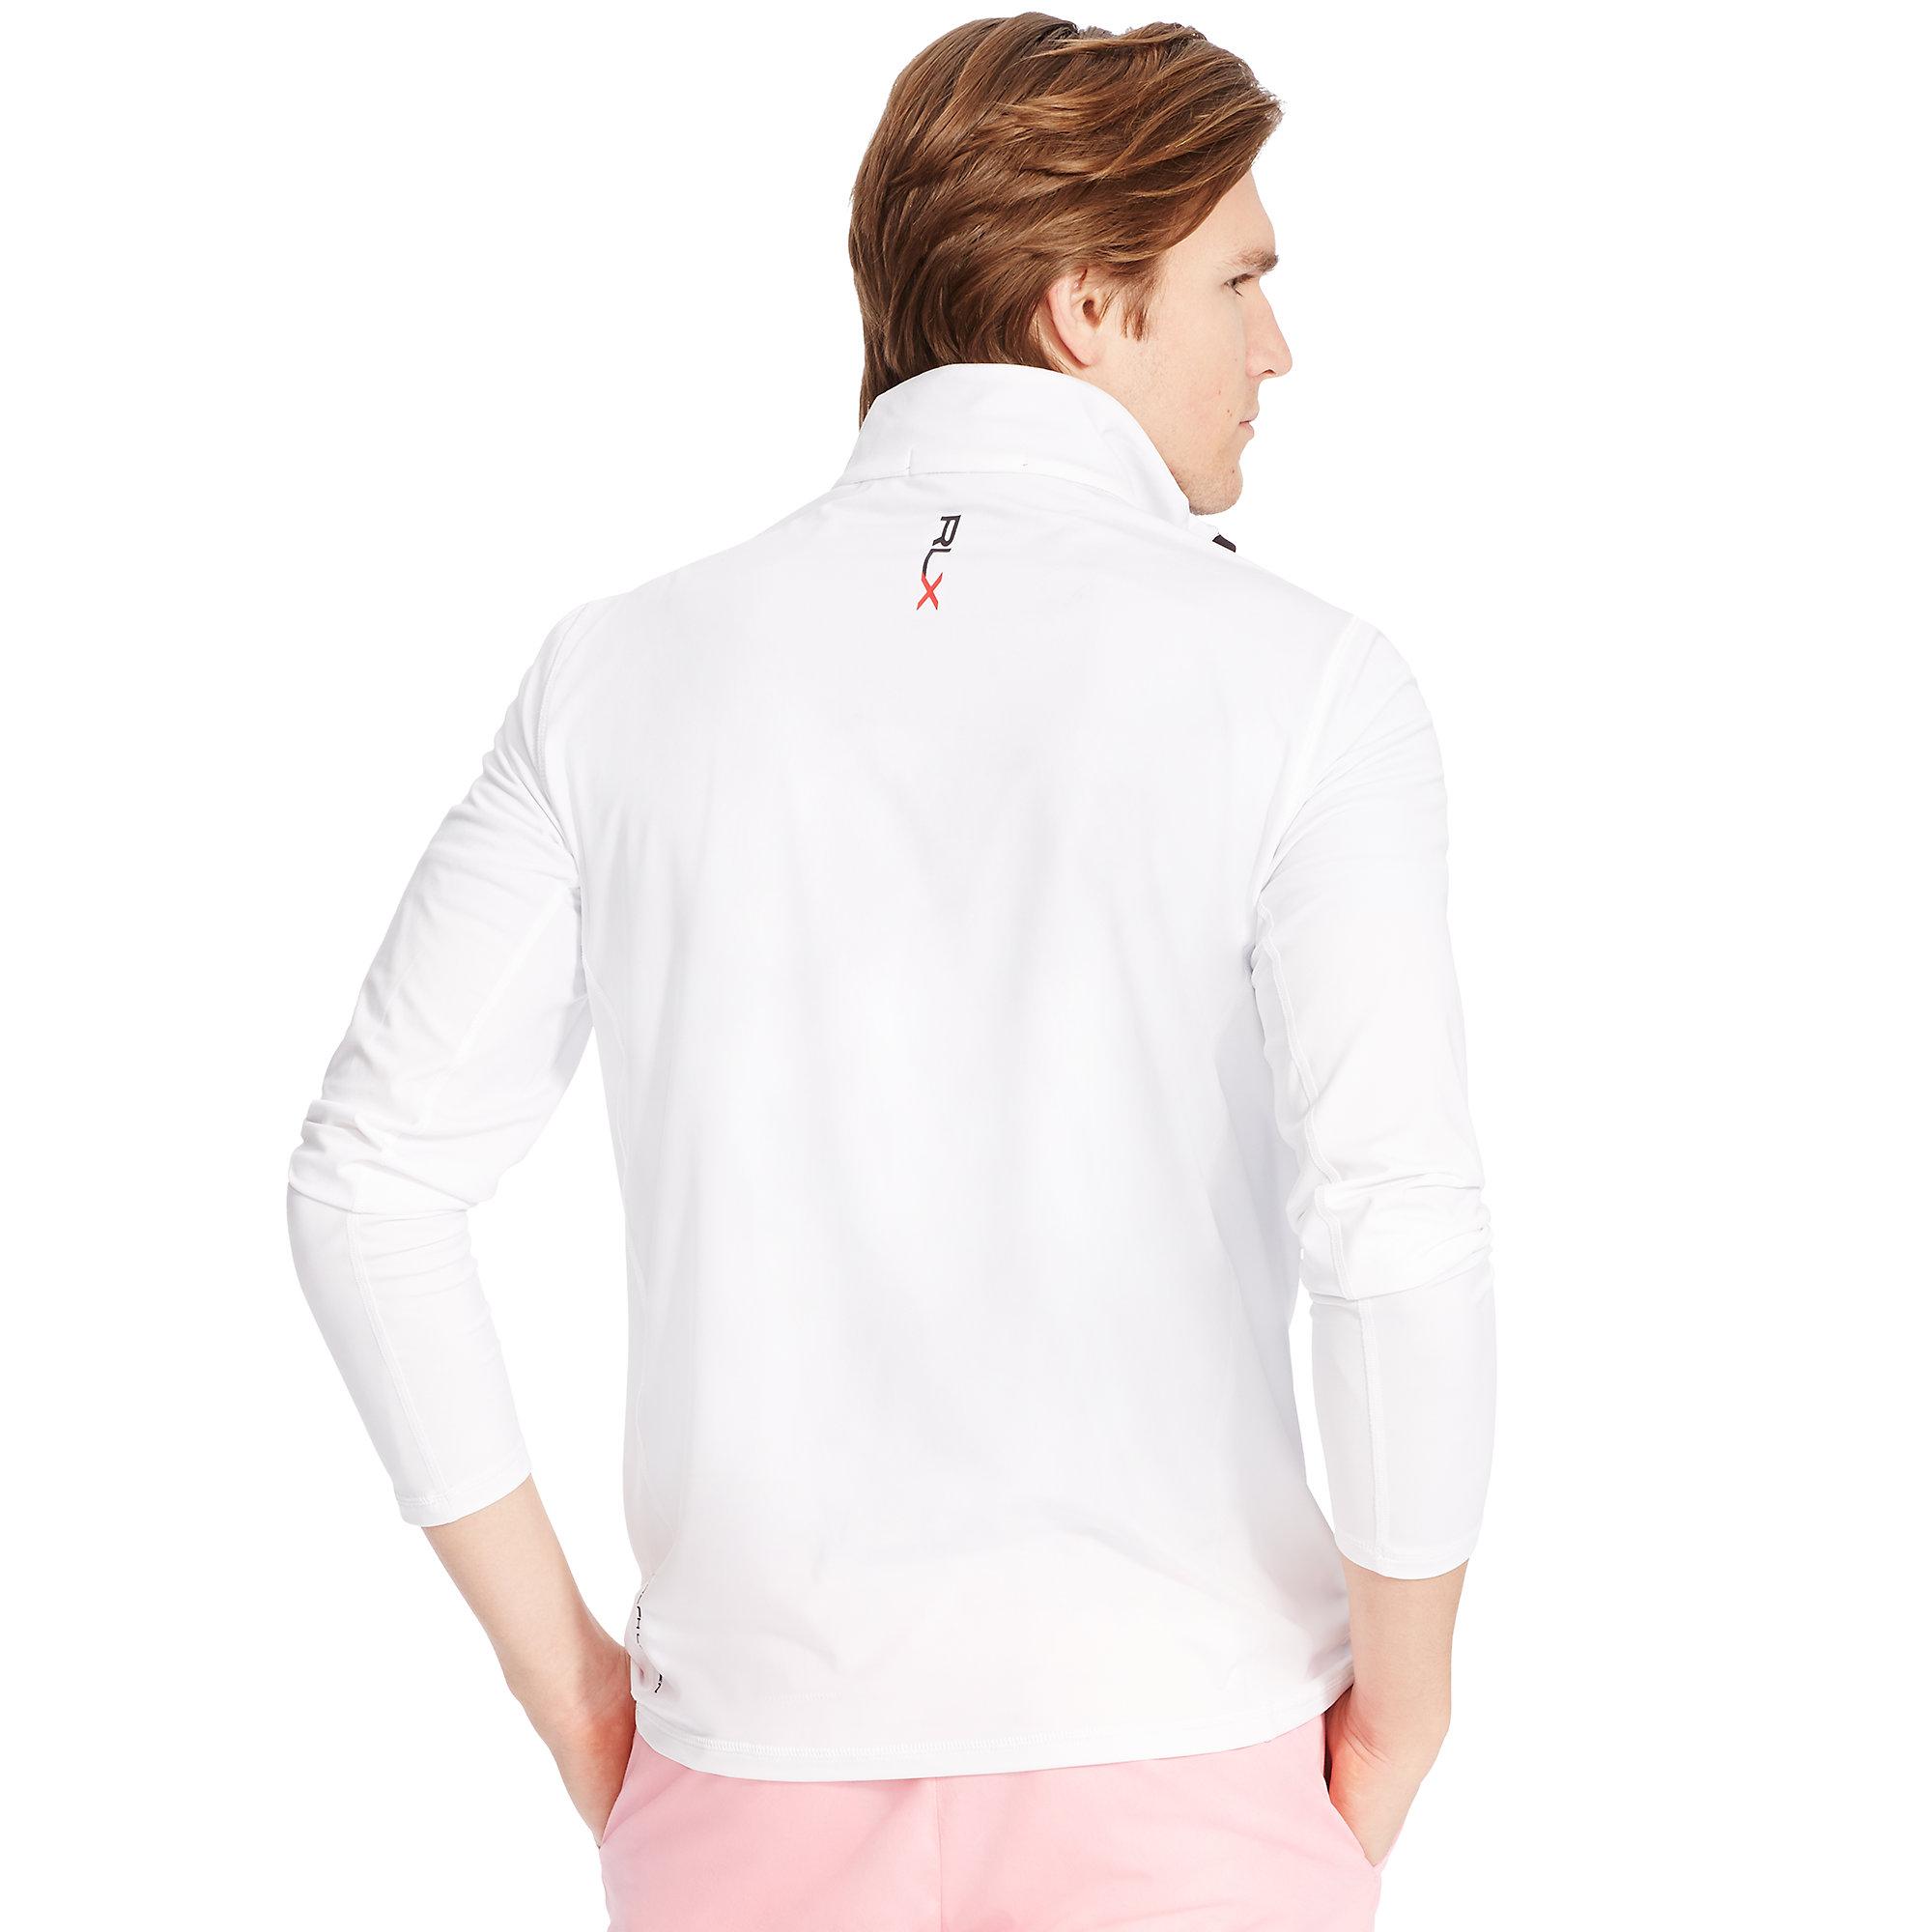 lyst ralph lauren stretch half zip pullover in white for men. Black Bedroom Furniture Sets. Home Design Ideas